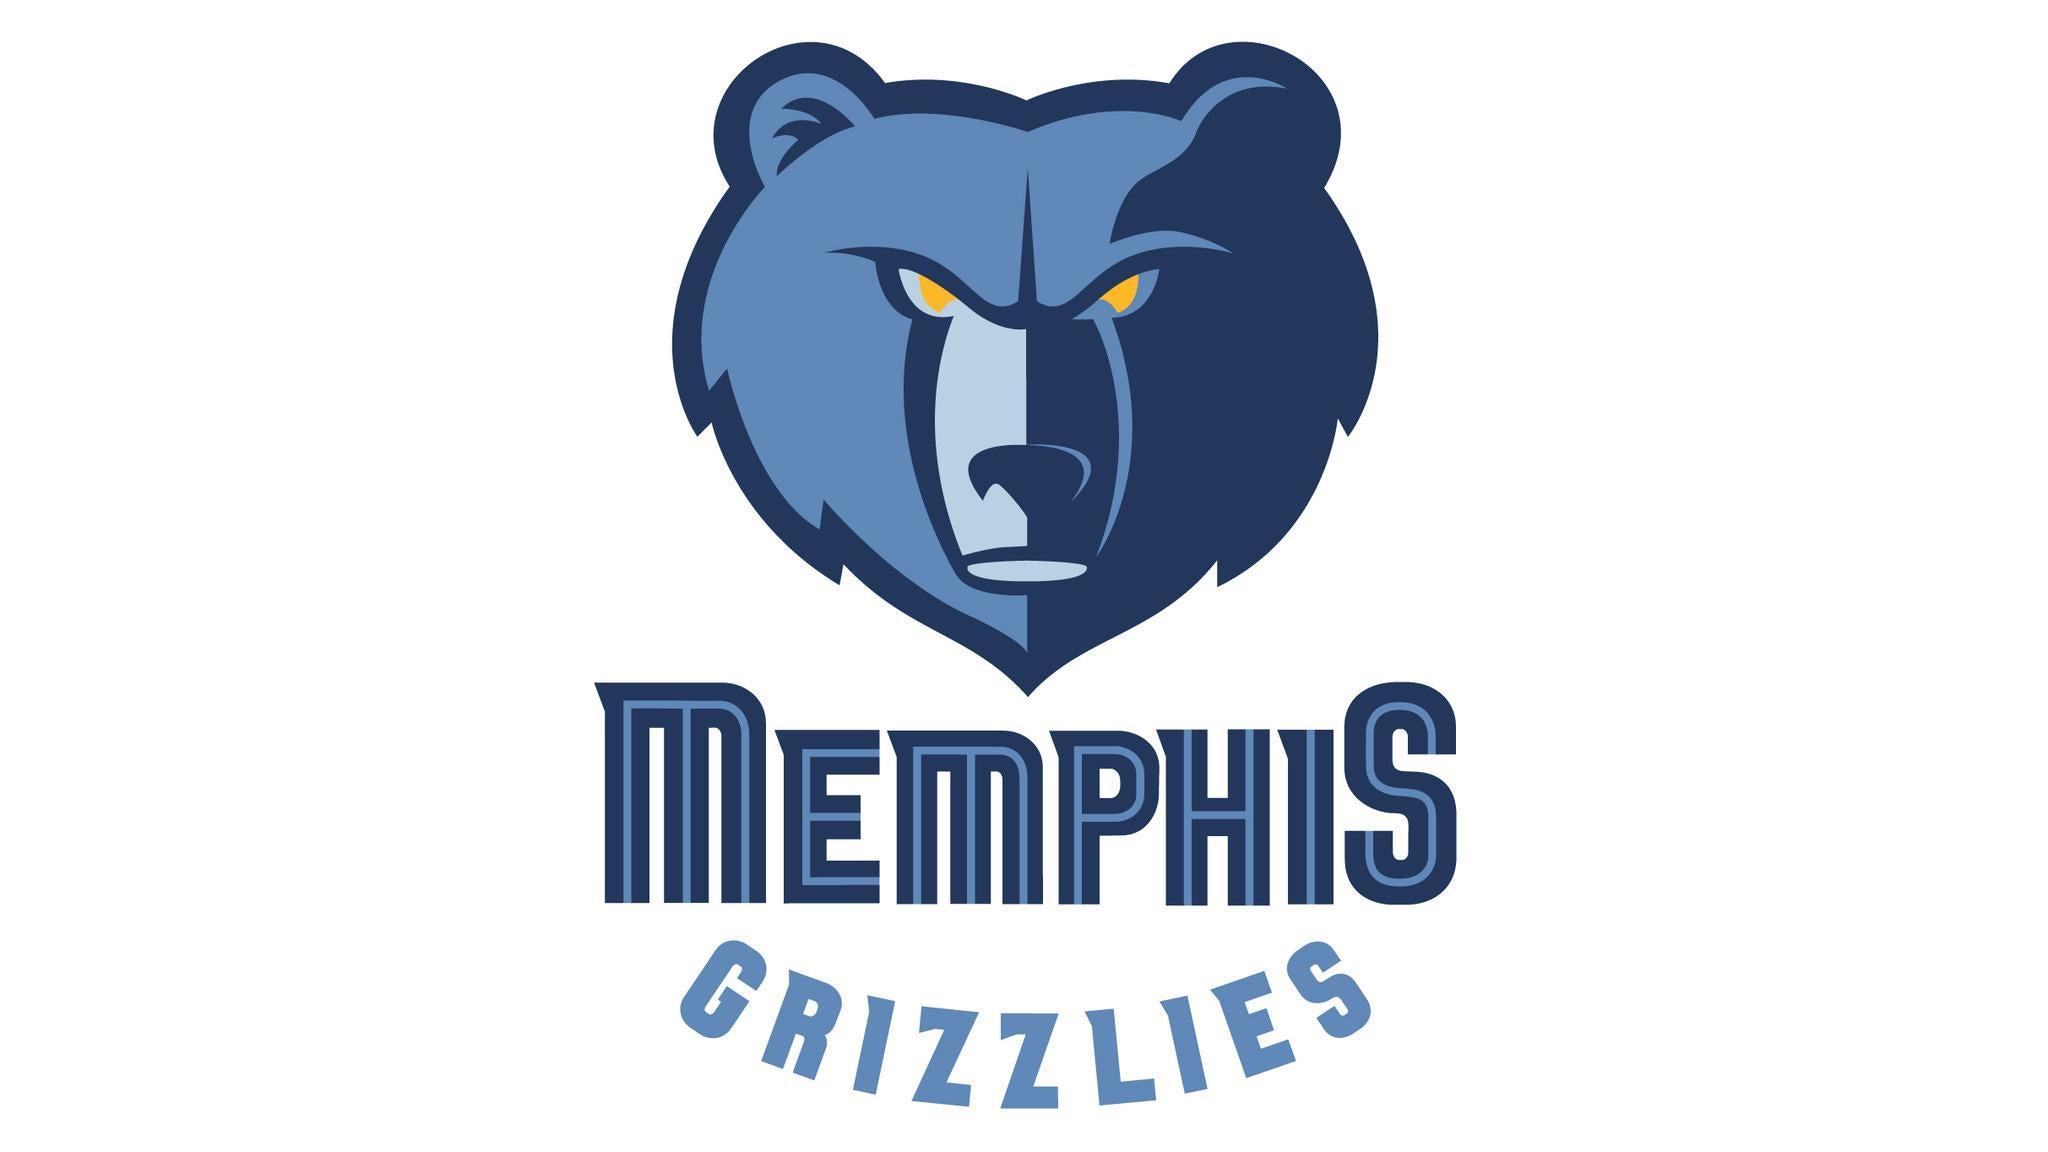 Memphis Grizzlies vs. Washington Wizards at FedExForum